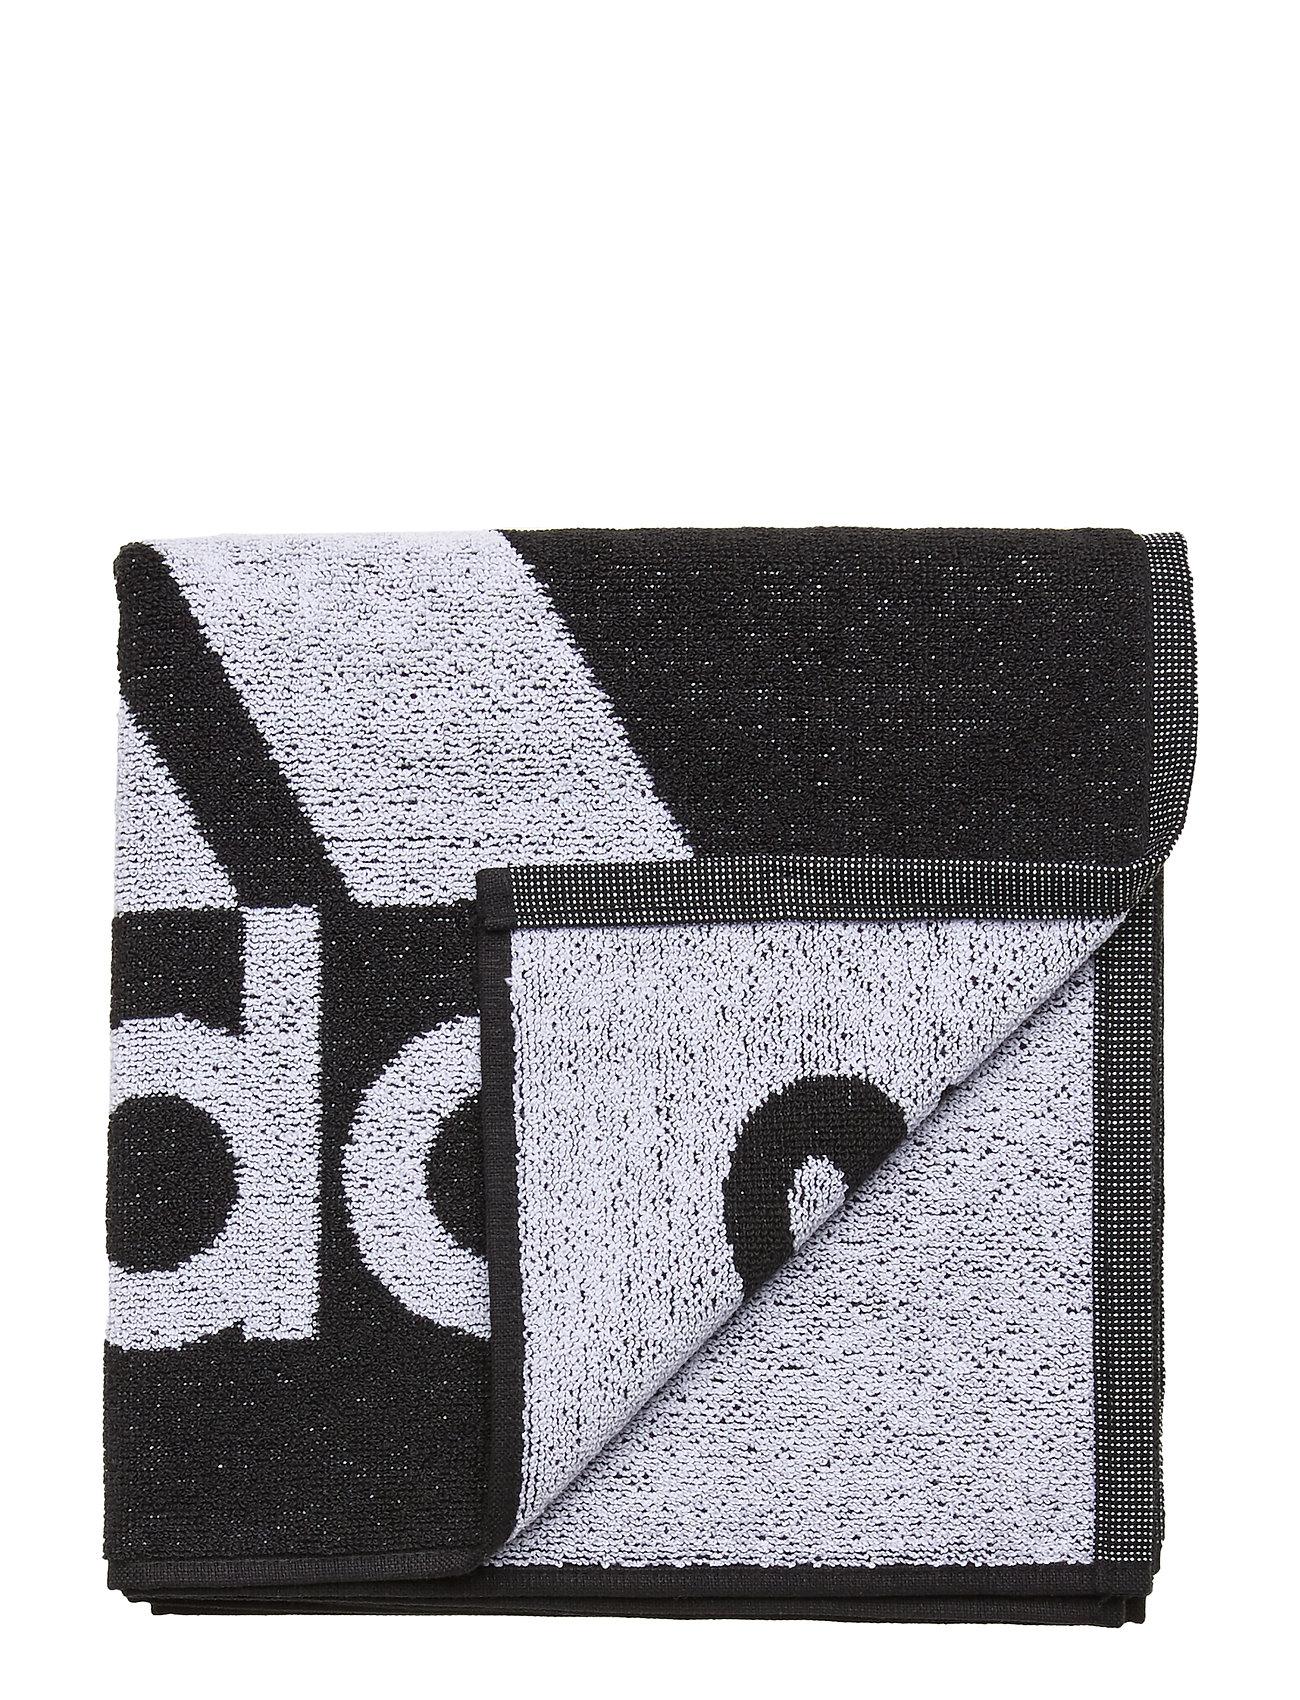 adidas Performance ADIDAS TOWEL S - BLACK/WHITE